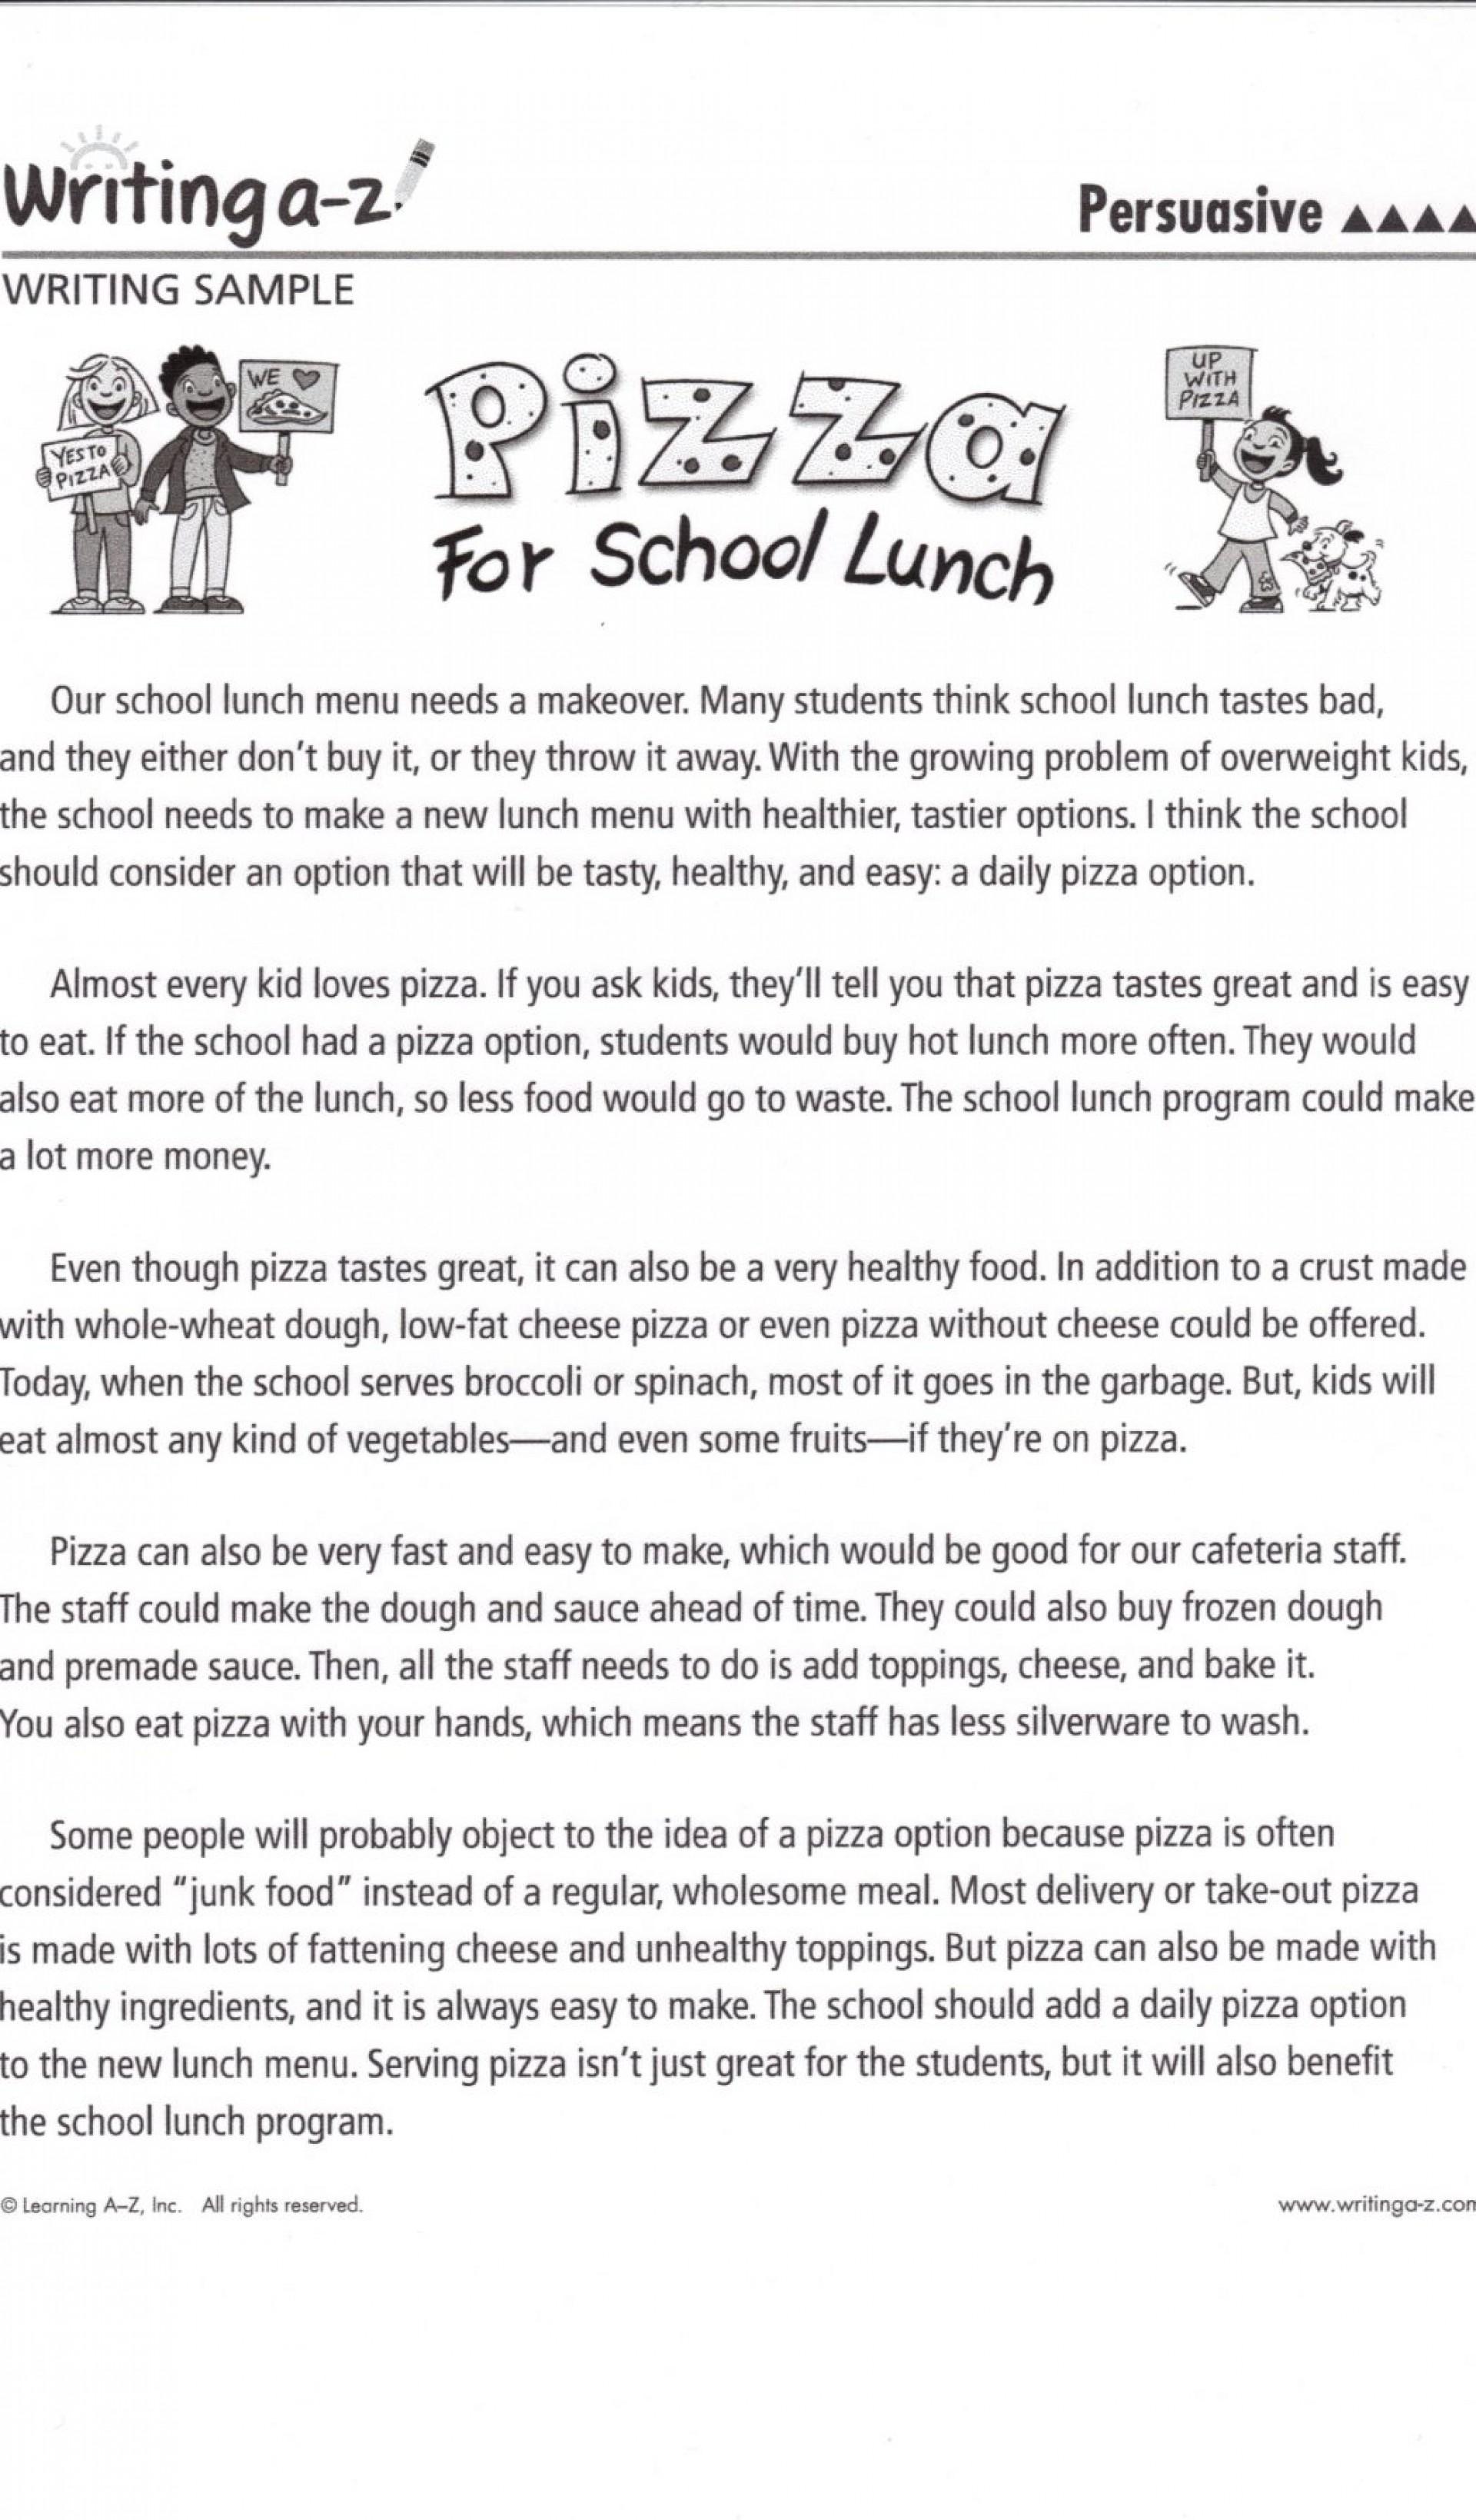 016 Healthy Eating Essay Example High School Persuasive Topics Sample Essays Writing Article Argumentative Impressive Spm Habits Pdf 1920